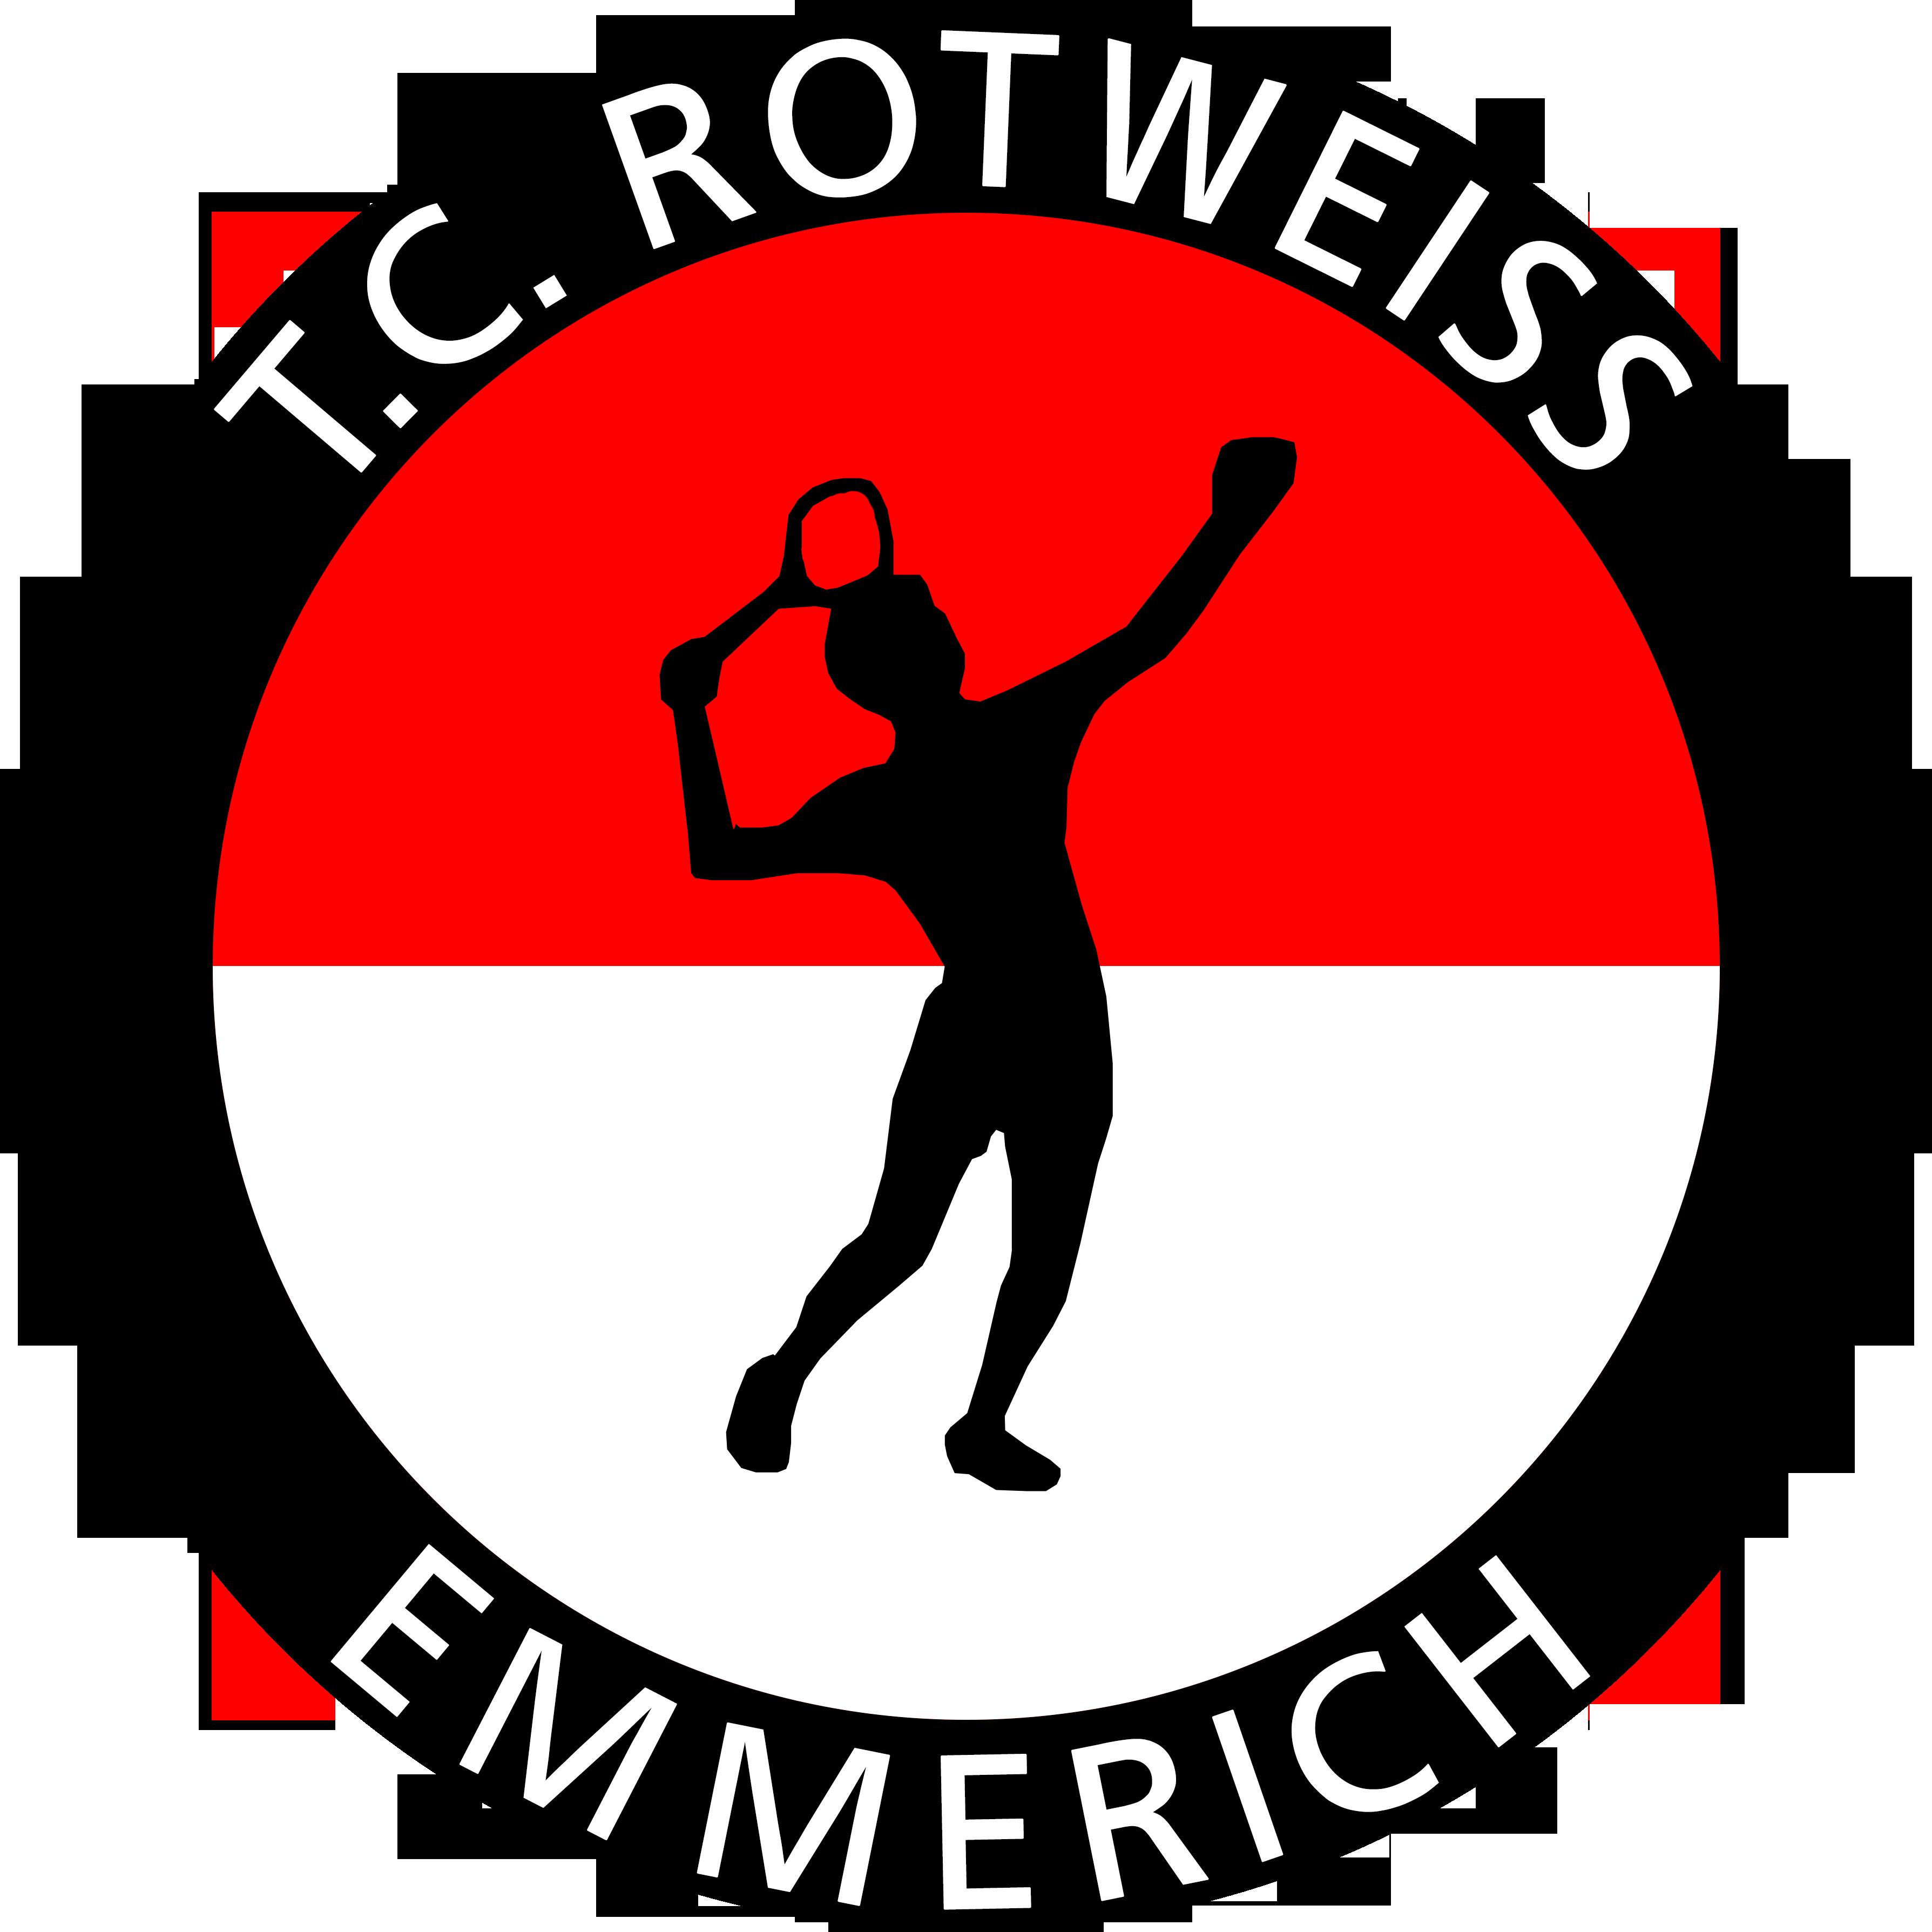 TC Rotweiss Emmerich e.V.